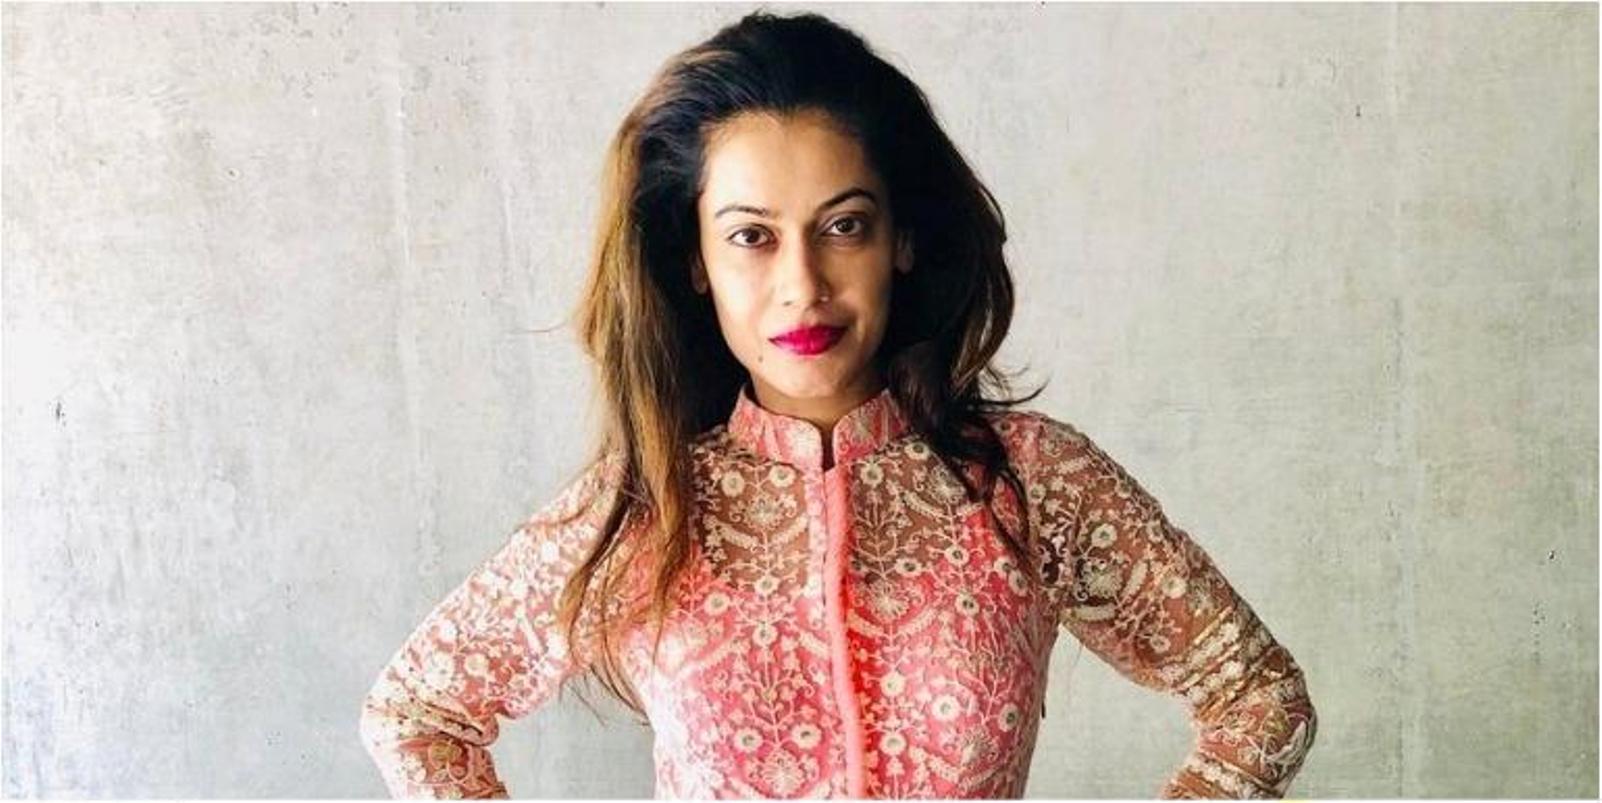 बॉलीवुड अभिनेत्री पायल रोहतगी कथित रूप से राजस्थान पुलिस द्वारा गिरफ्तार।